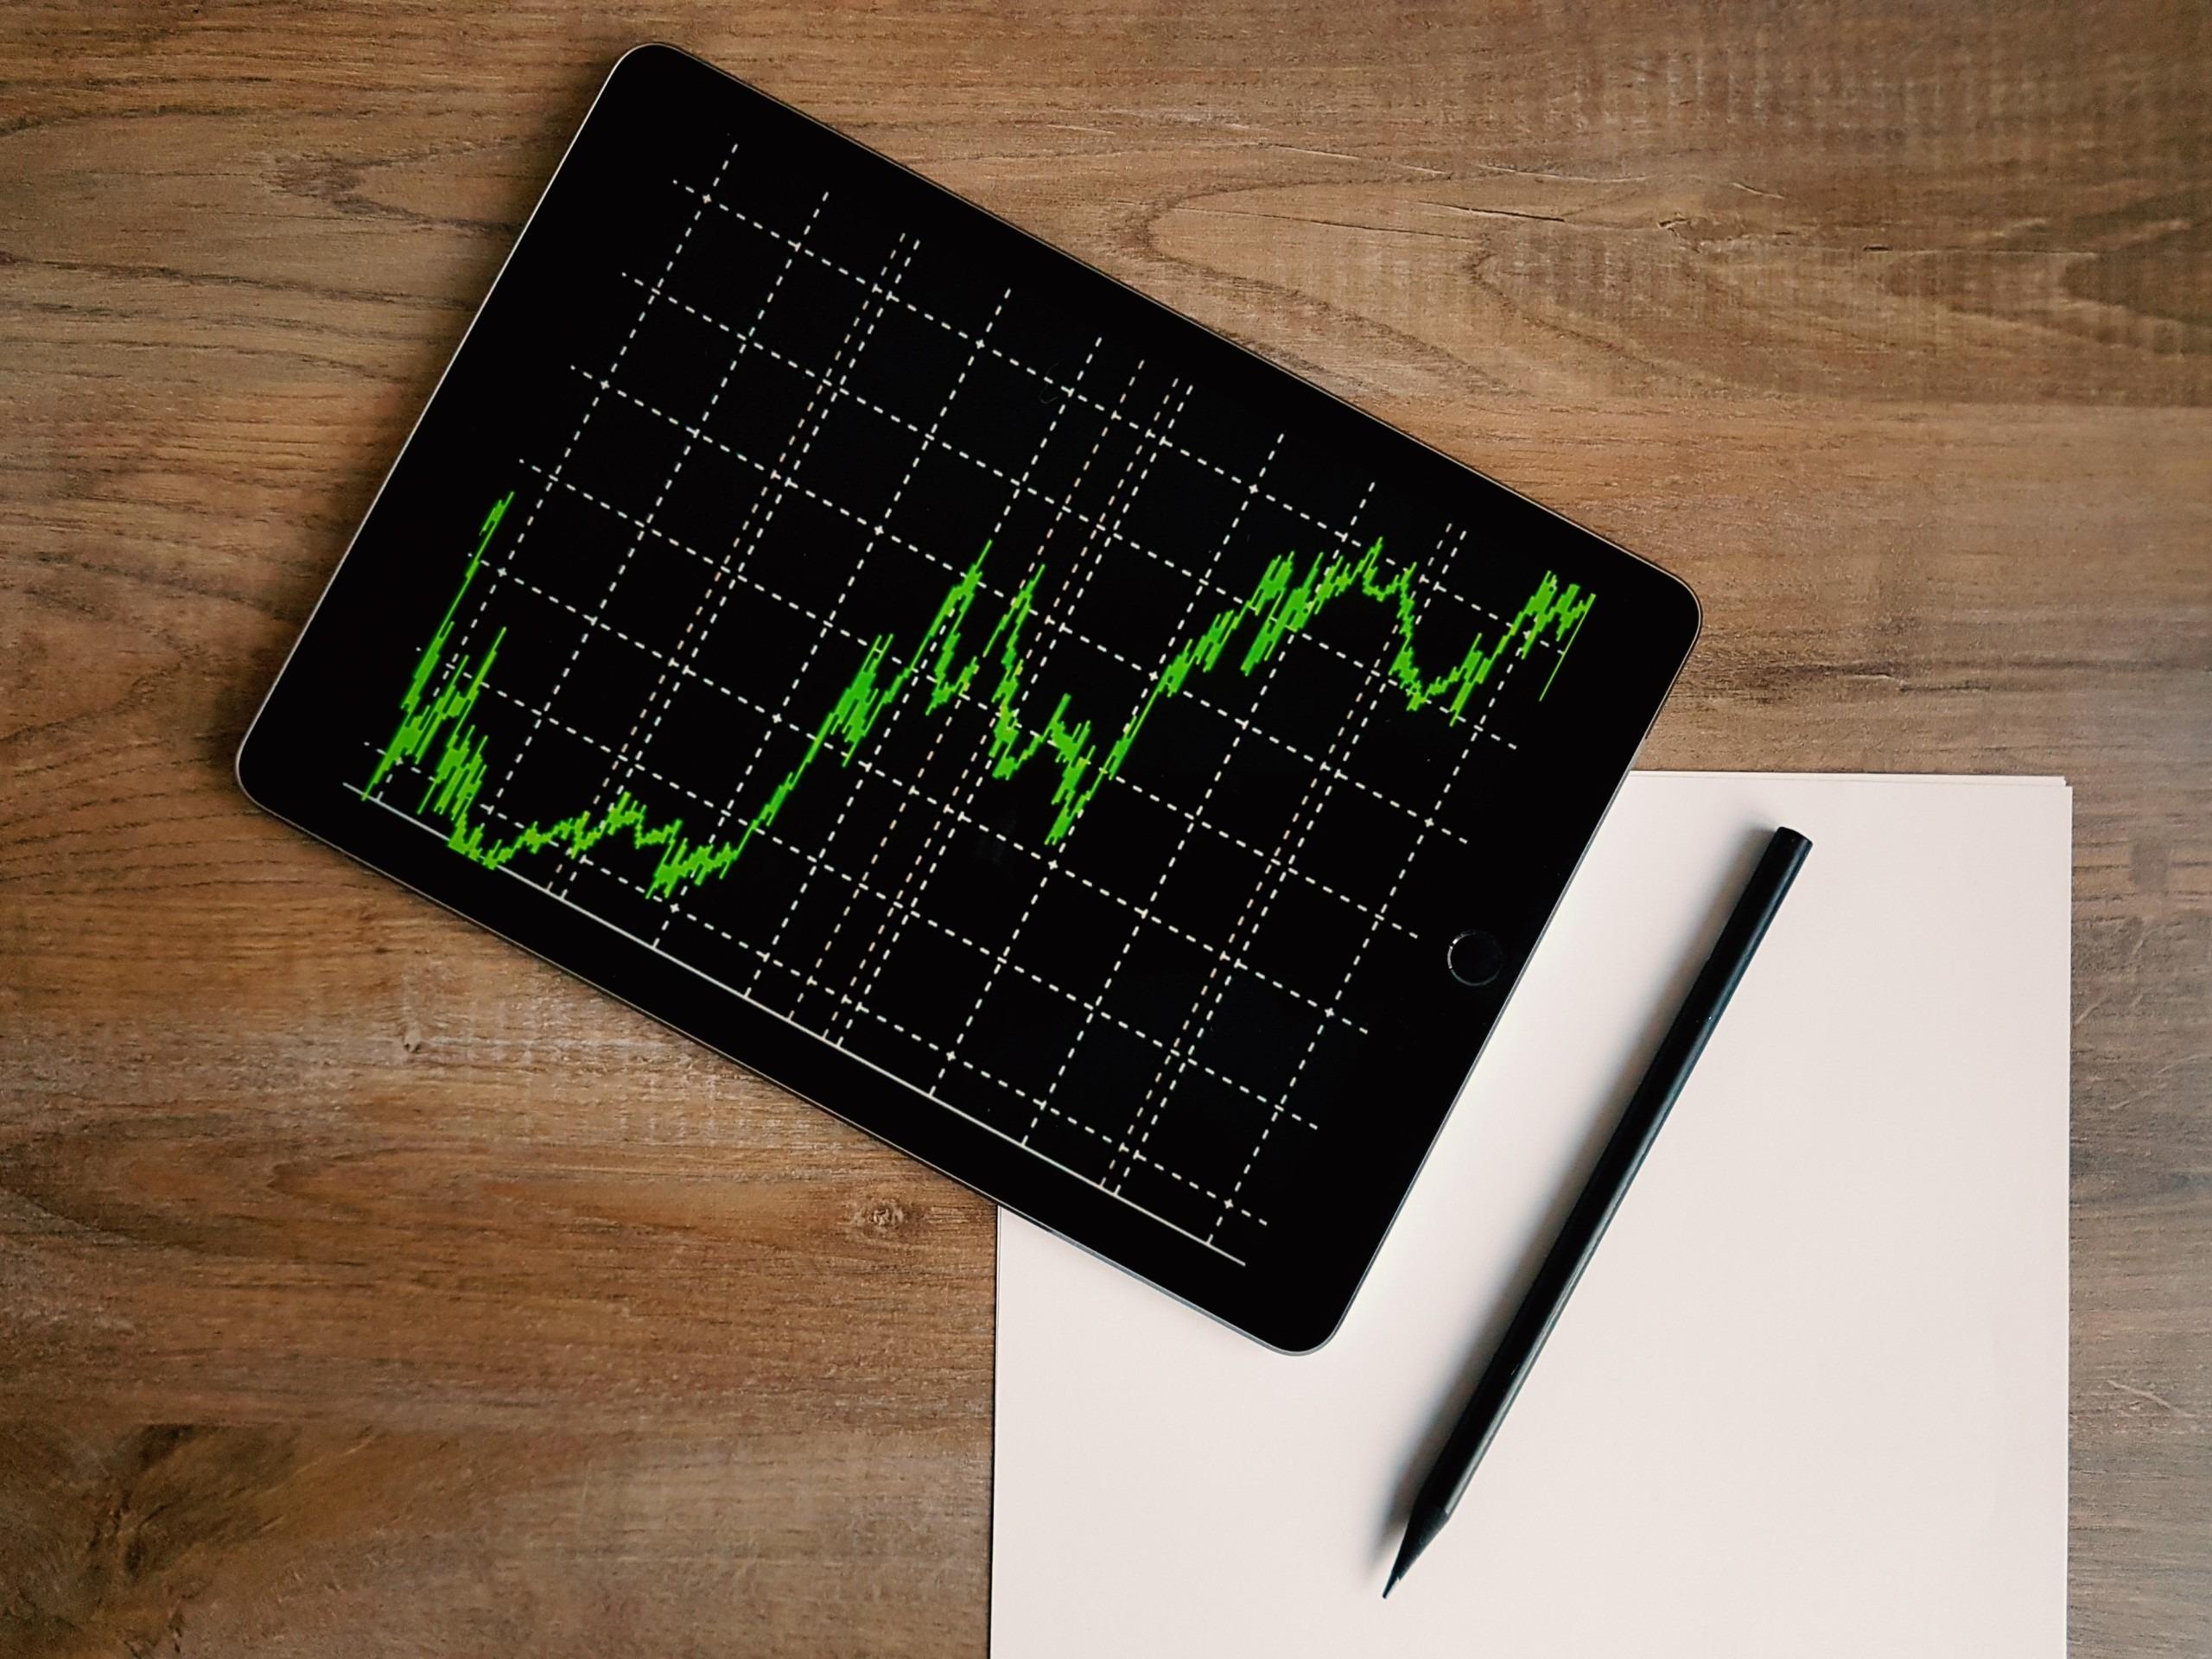 Top 8 Best Stock Market Apis For